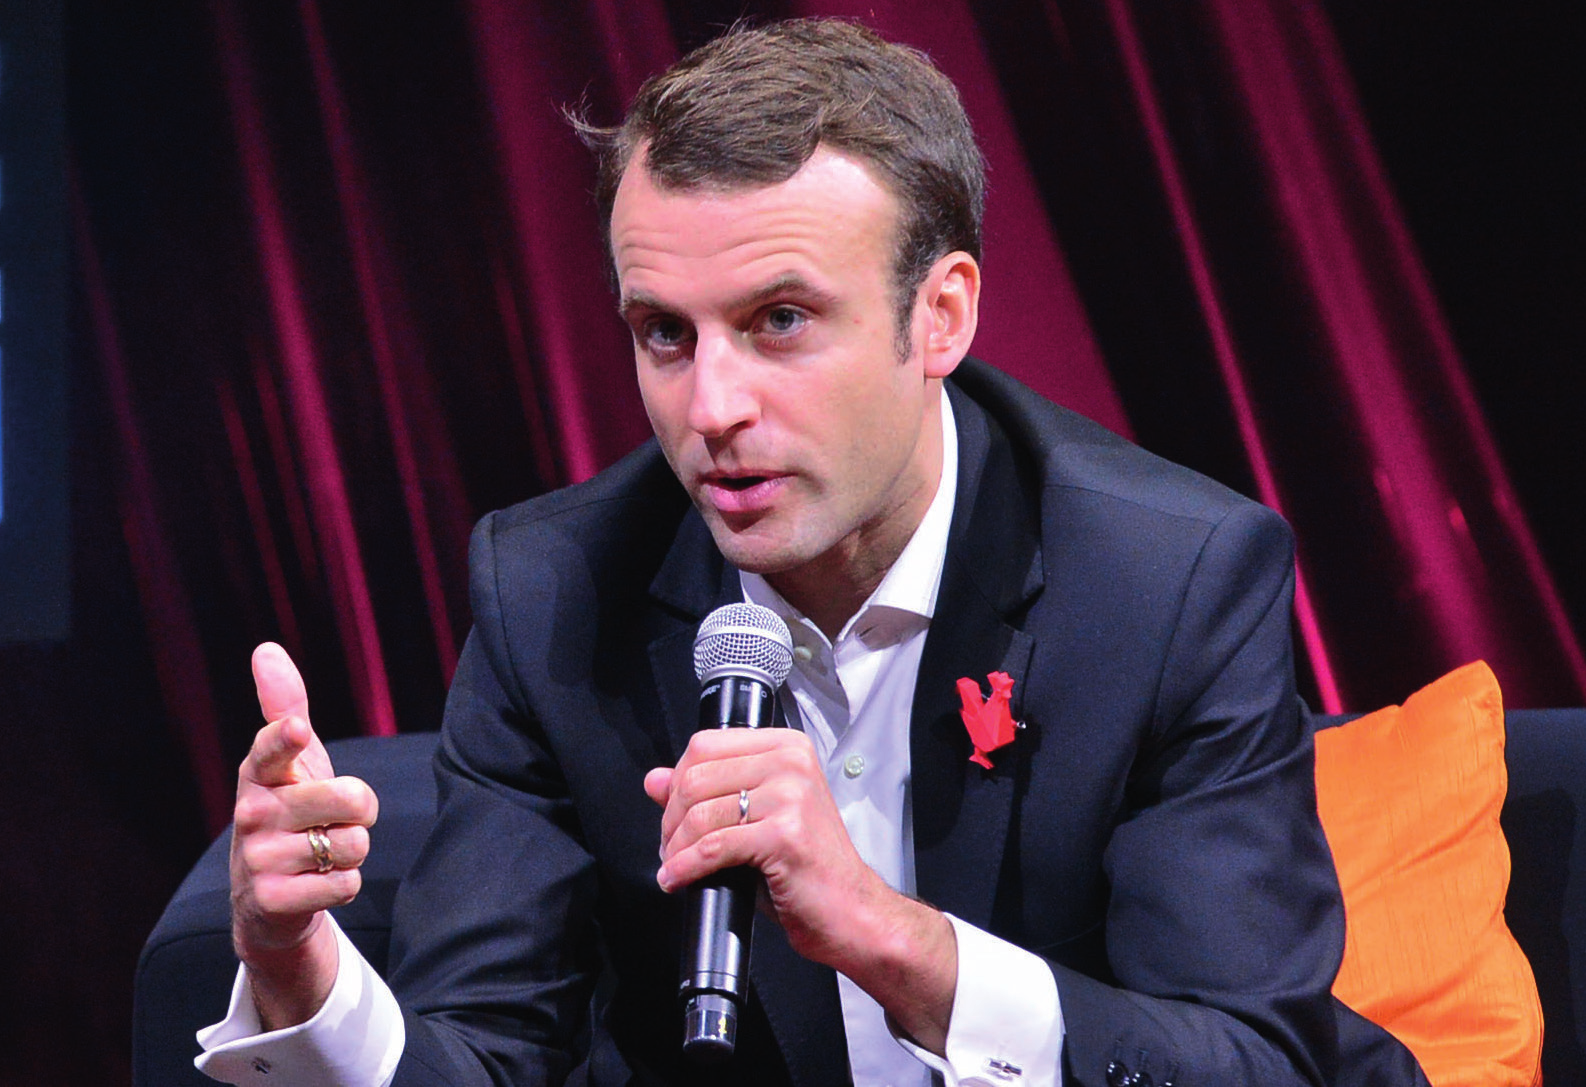 Emmanuel Macron as France's new President